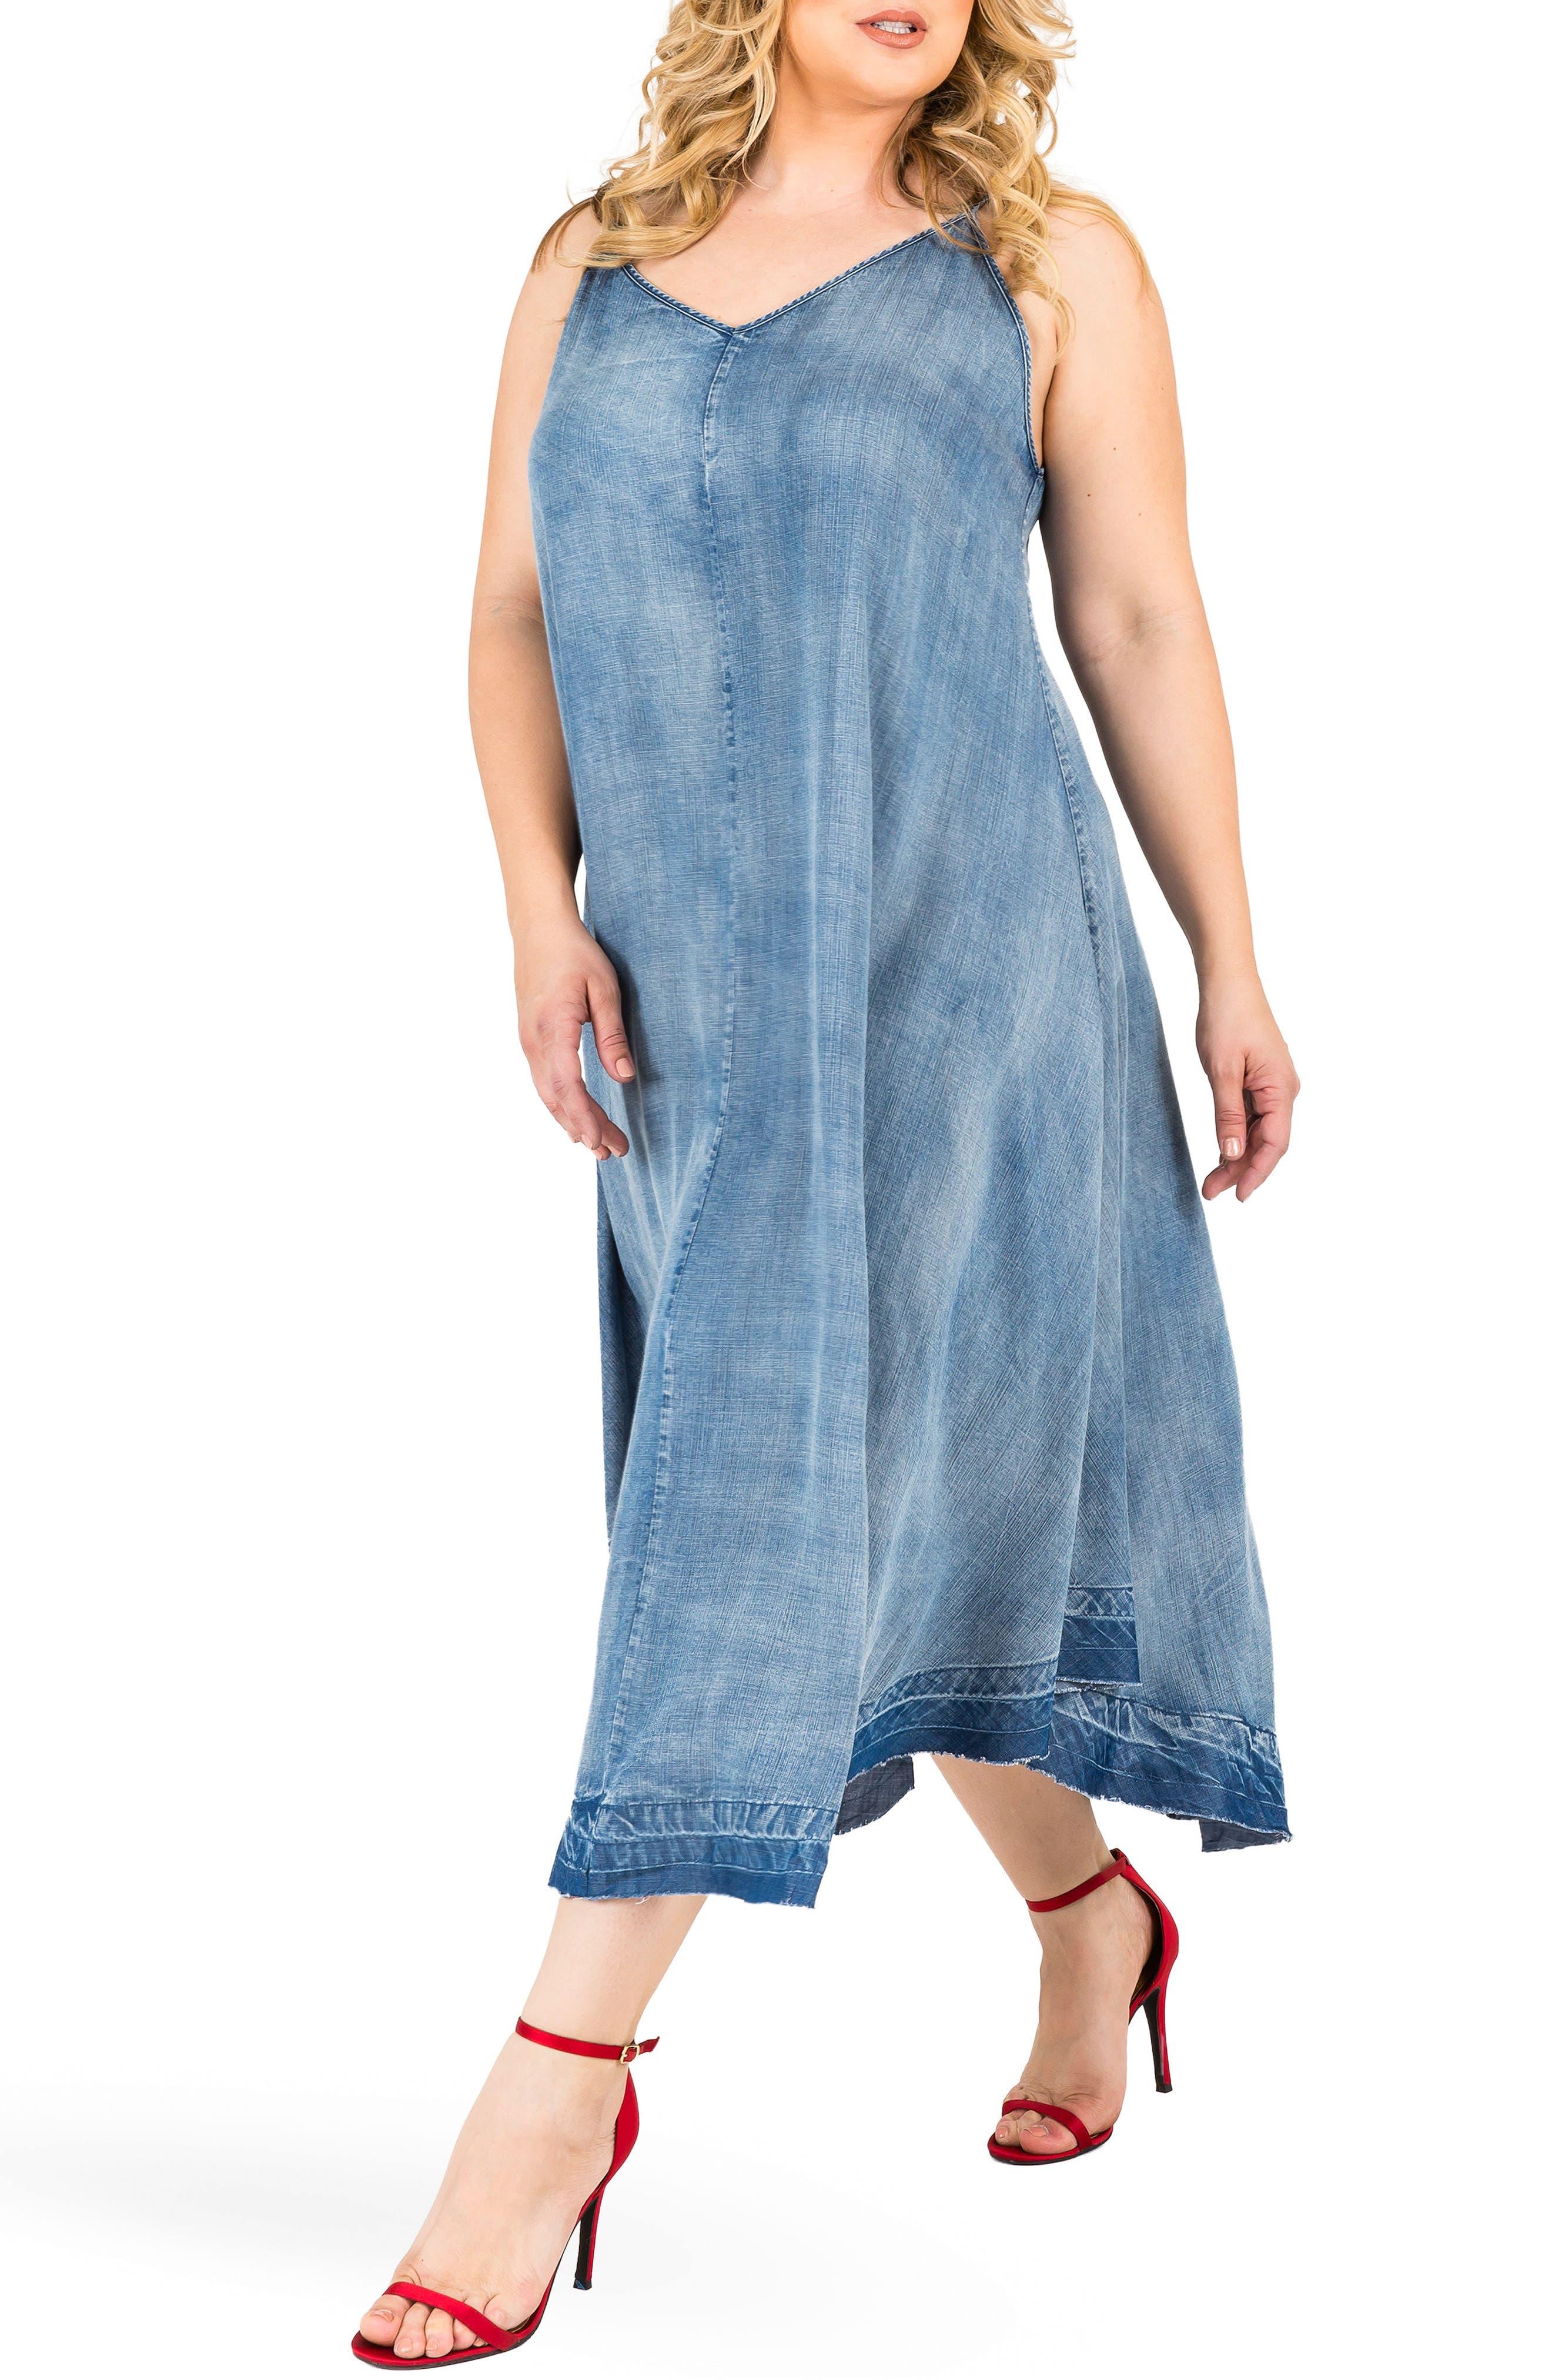 STANDARDS & PRACTICES,                             Taylor Tank Denim Midi Dress,                             Main thumbnail 1, color,                             MEDIUM BLUE